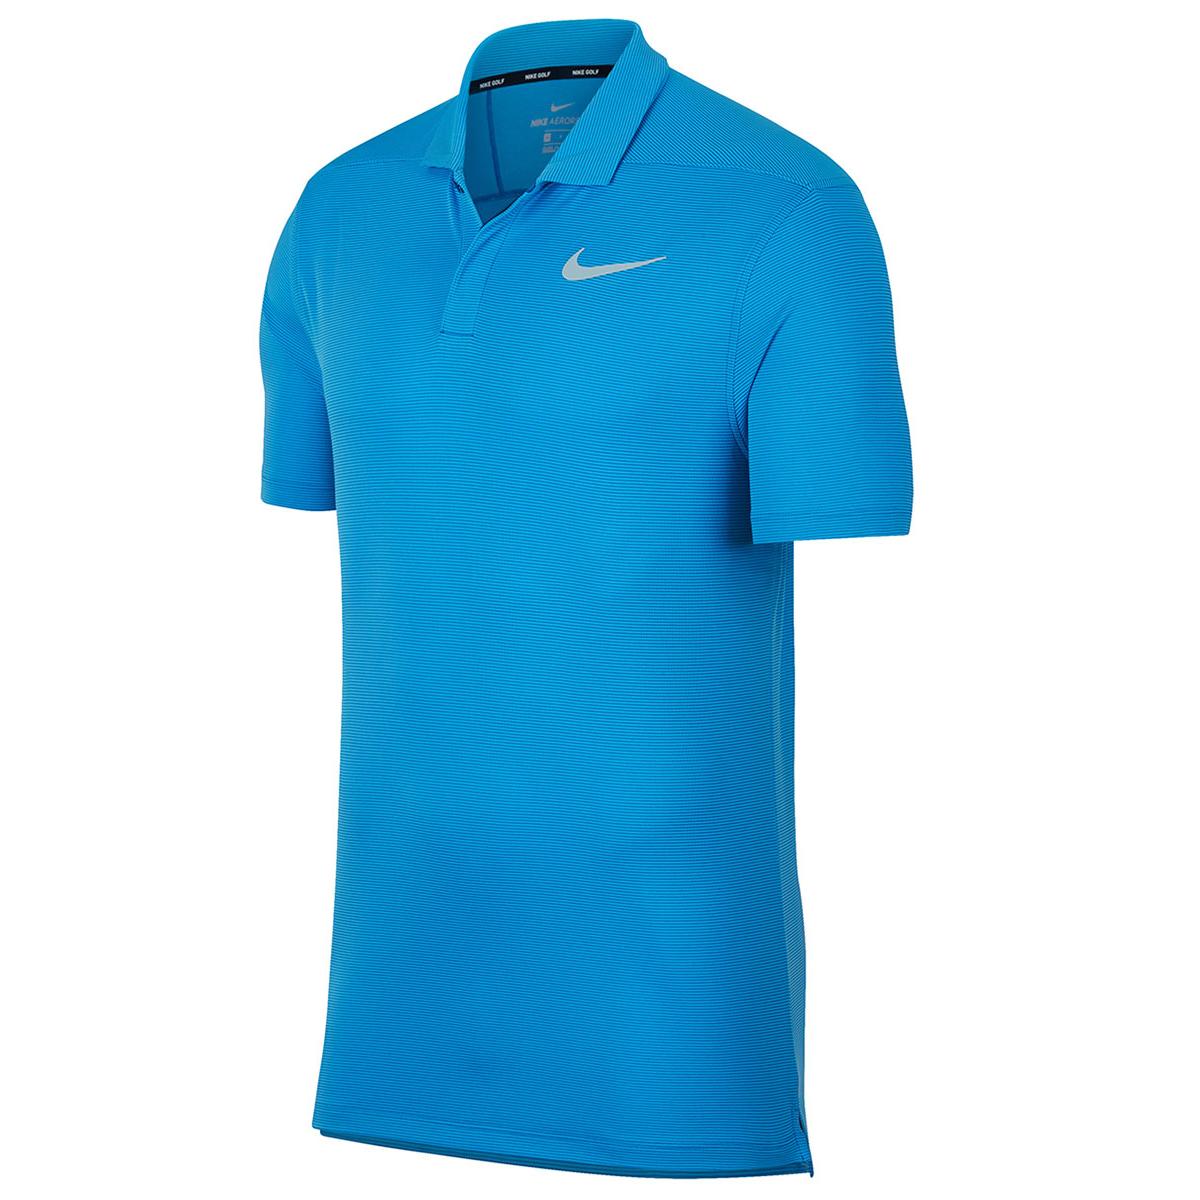 Nike Golf AeroReact Victory Polo Shirt